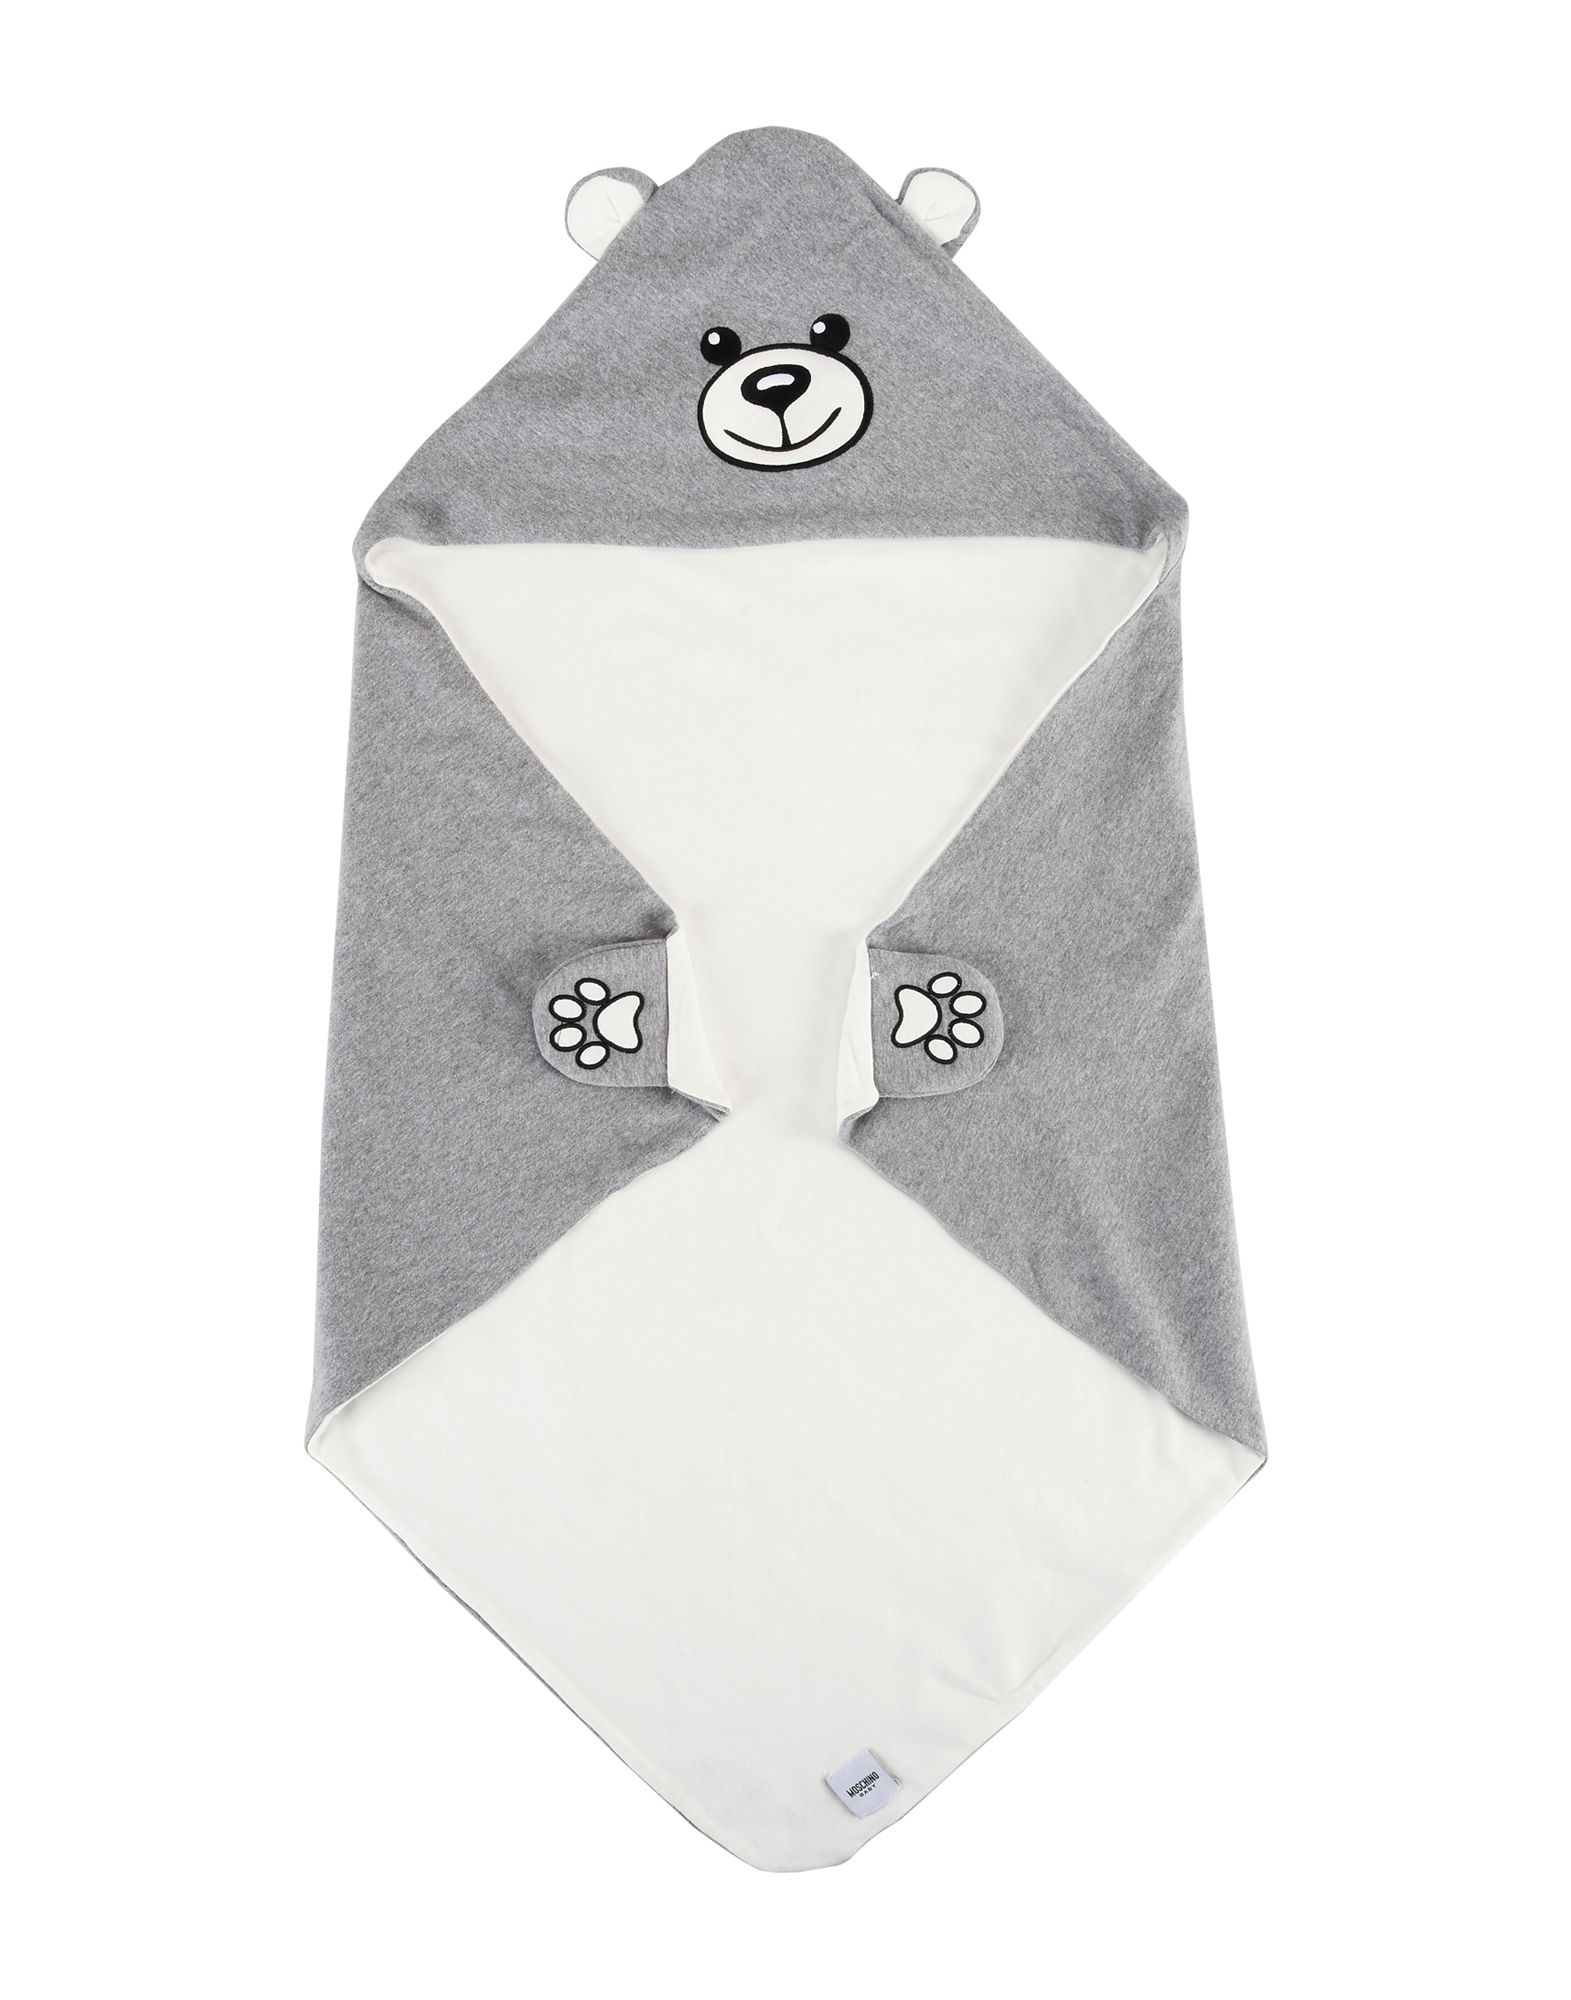 MOSCHINO BABY Unisex Wolldecke Farbe Grau Größe 1